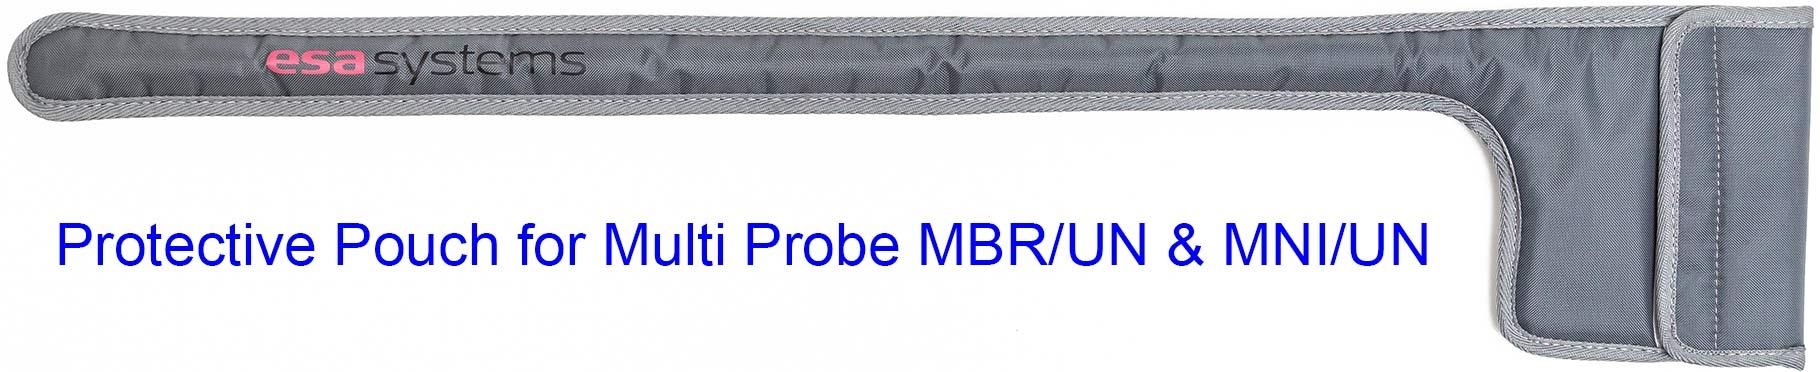 Protective Pouch MBR/UN and MNI/UN